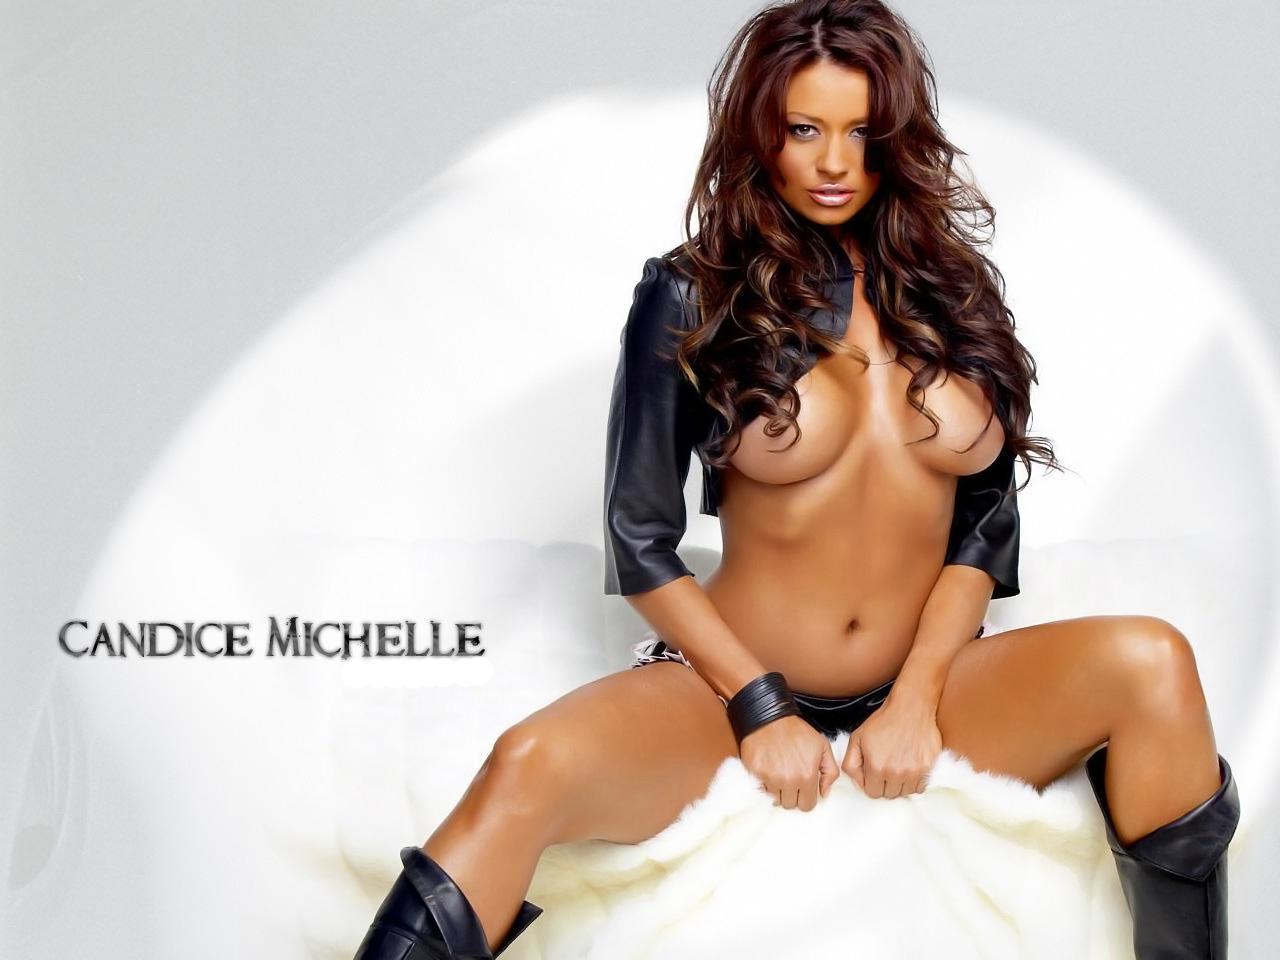 Candice Michelle | Llámalo XXX | Vídeos porno y buen sexo | XXX TV.